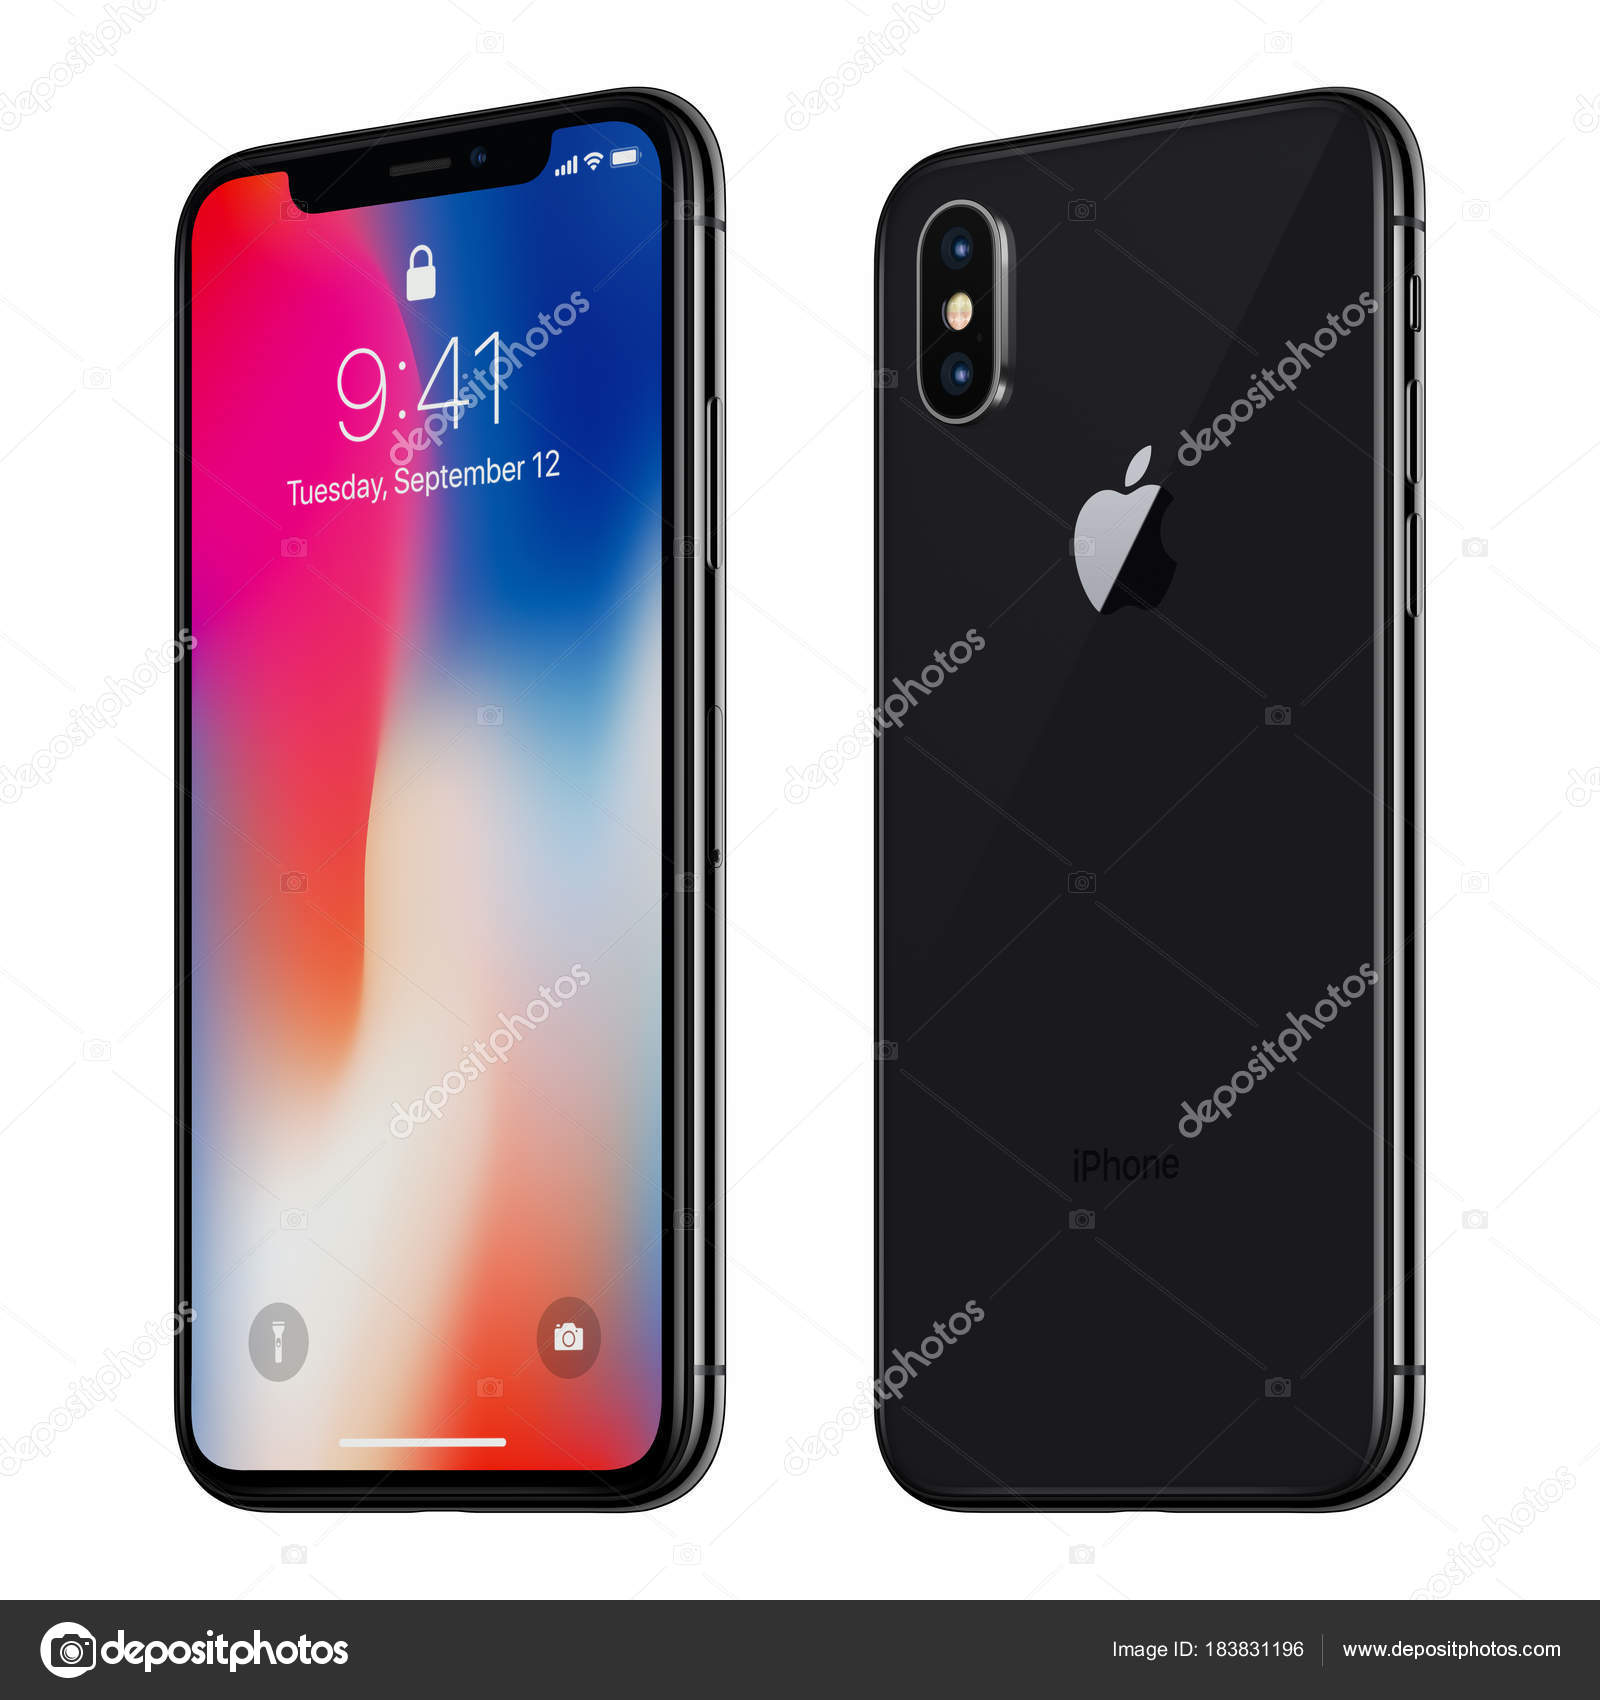 Black Tournee Apple Iphone X Avec Ios 11 Lockscreen Face Avant Et